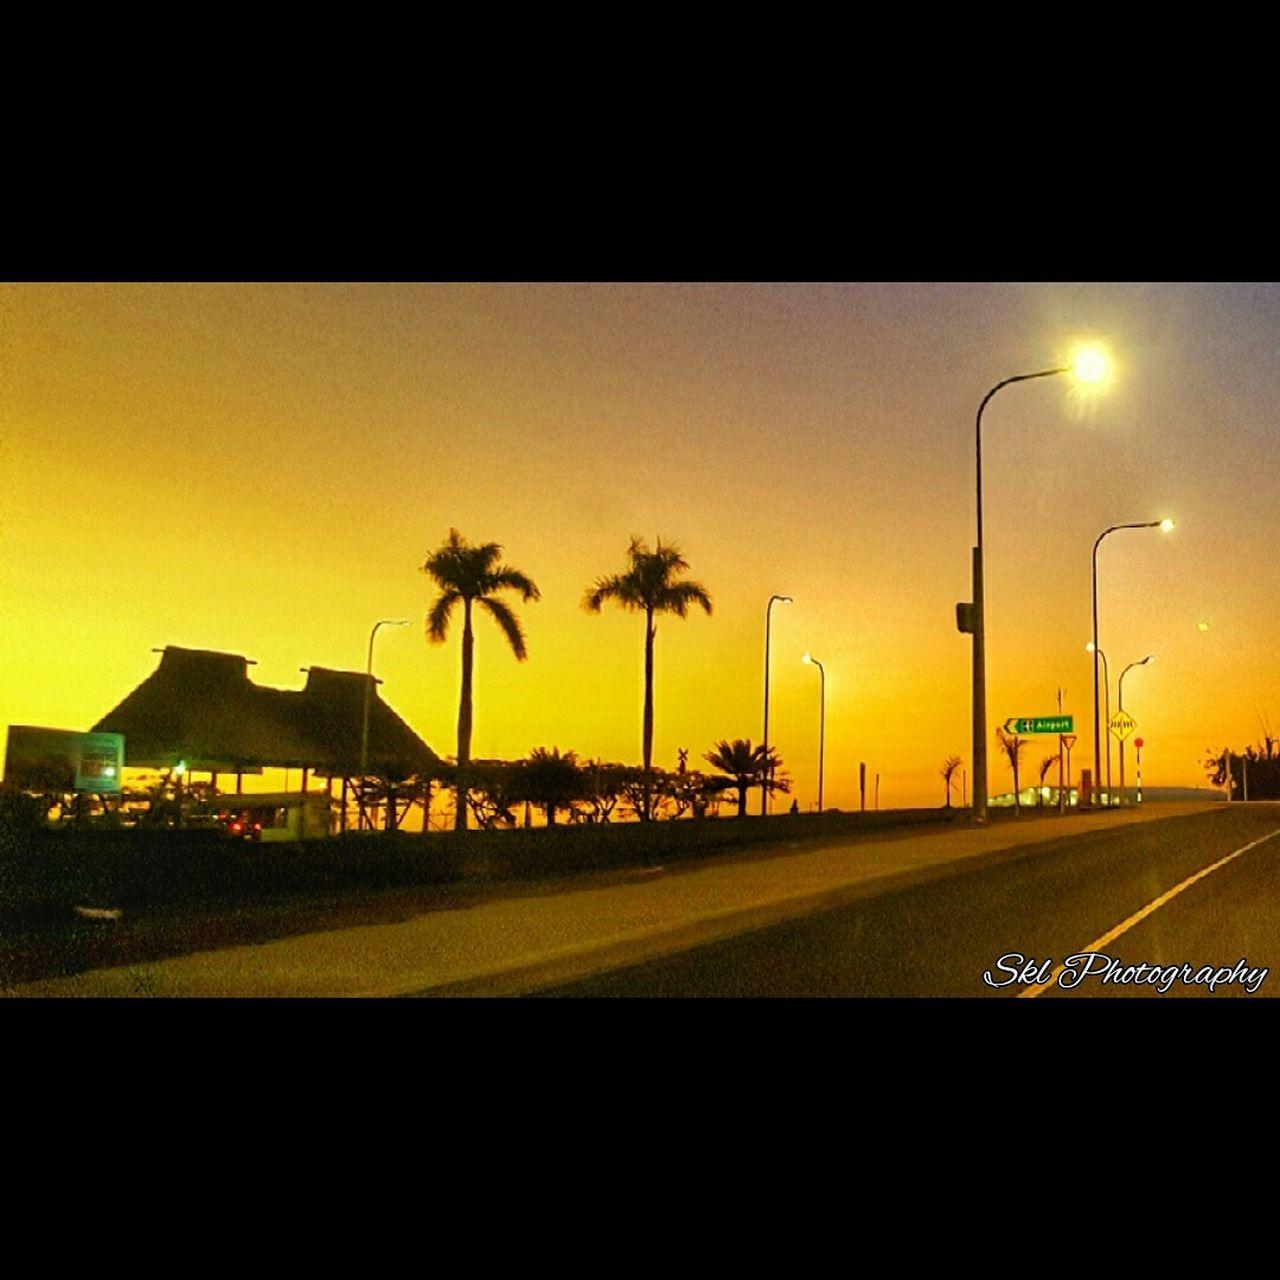 Bure Palm Trees Sunset Photography Cool Fiji Islands Peace